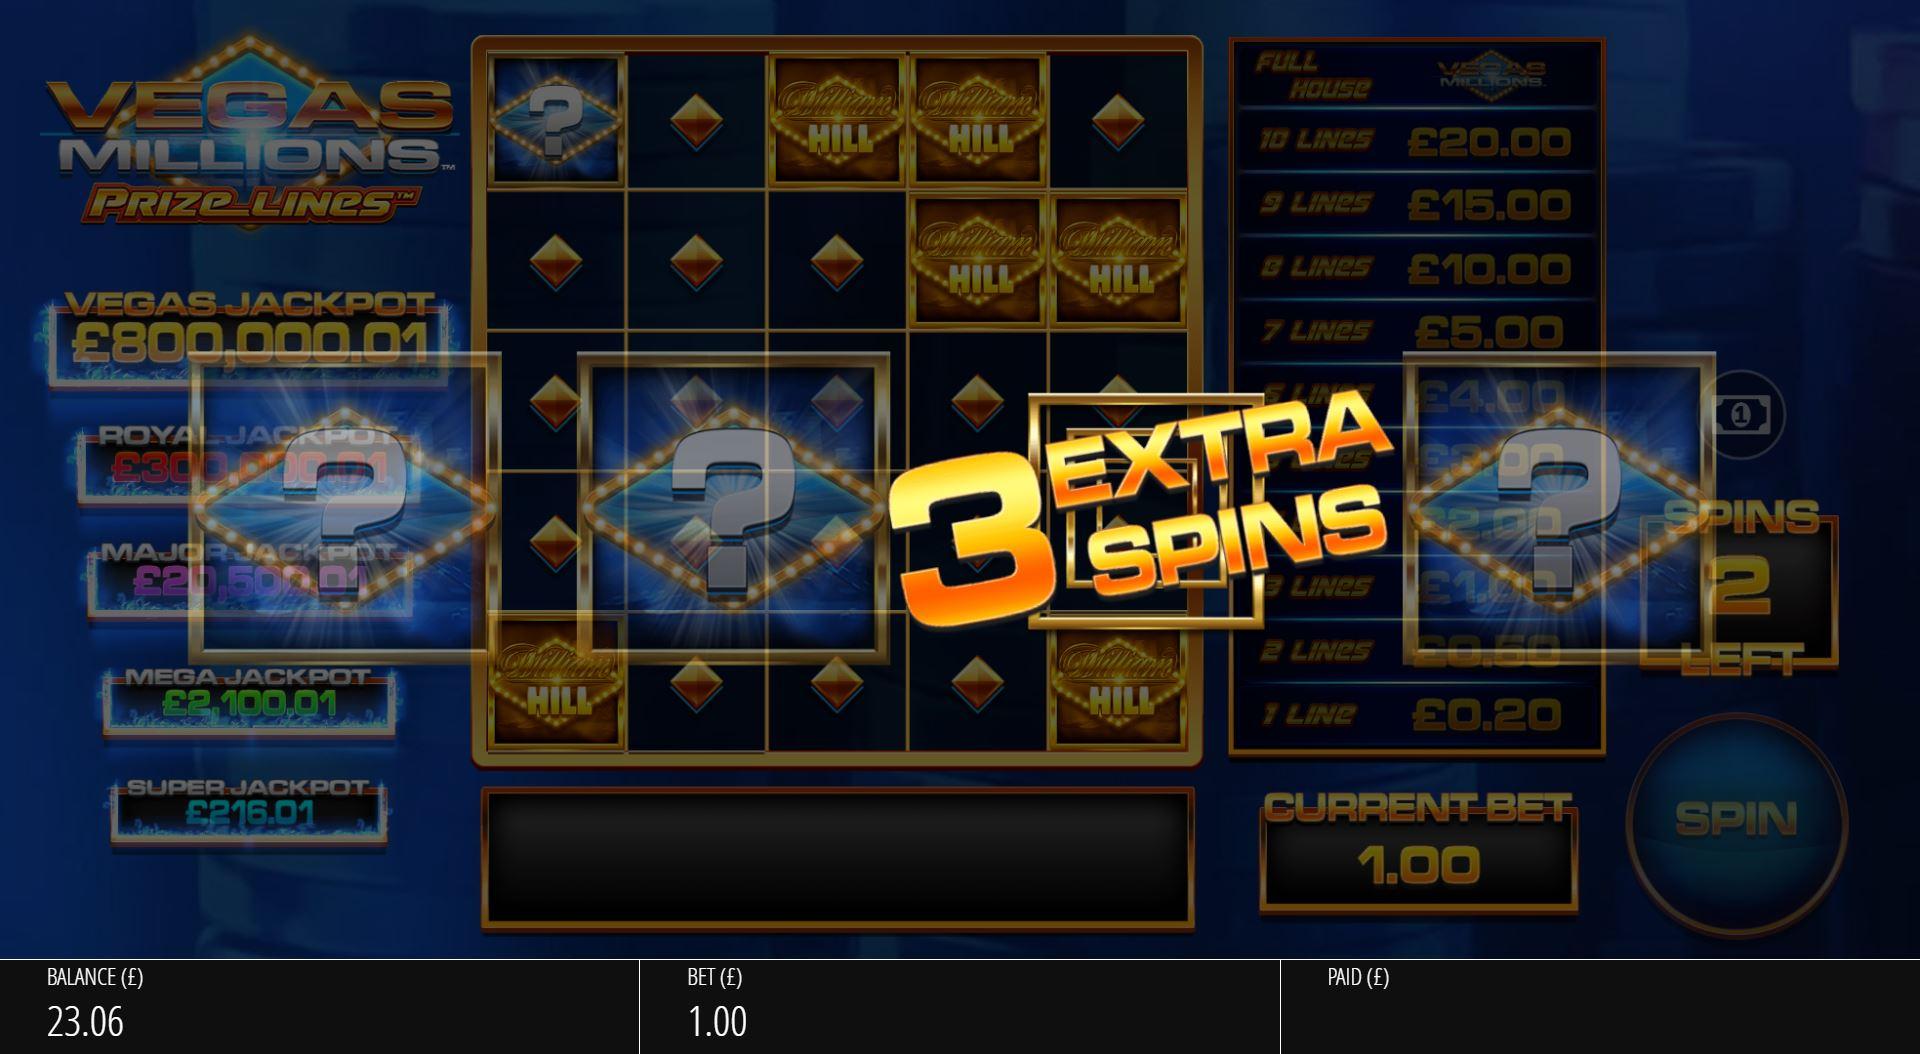 Vegas_Millions_Prize_Lines-Base - Box Reveal